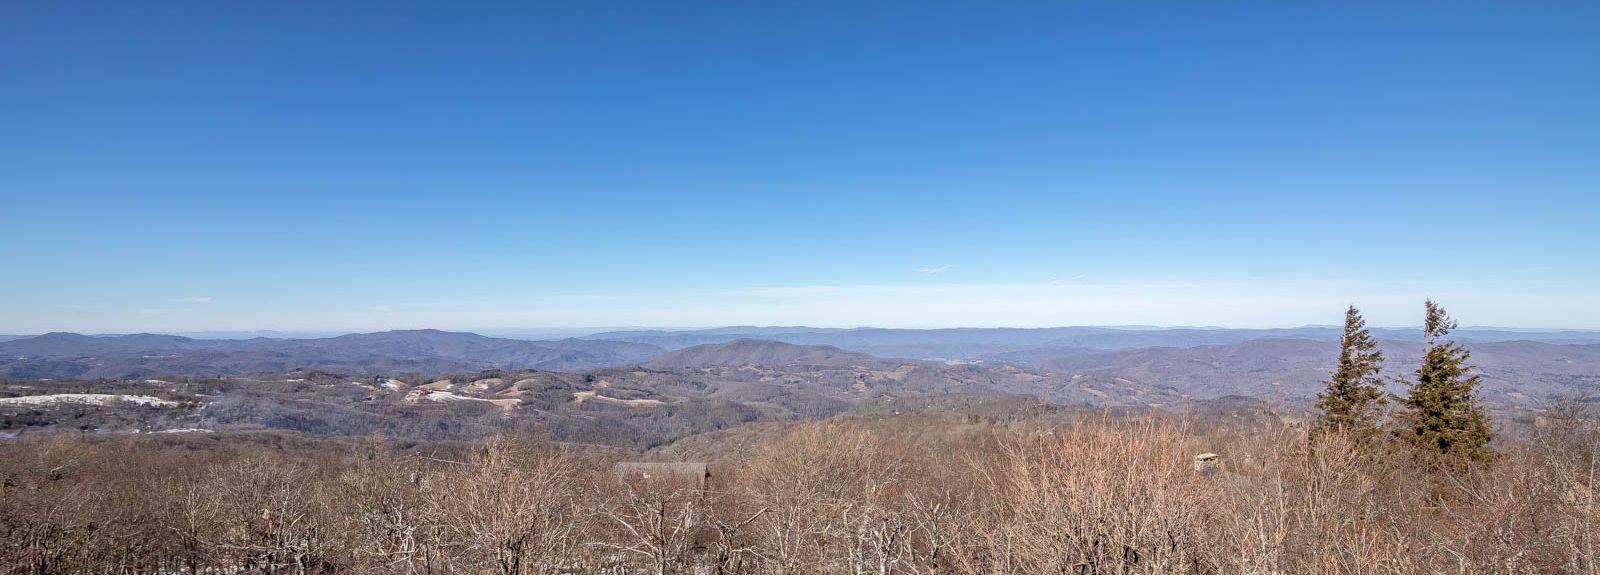 Charter Hills, Banner Elk, North Carolina, United States of America